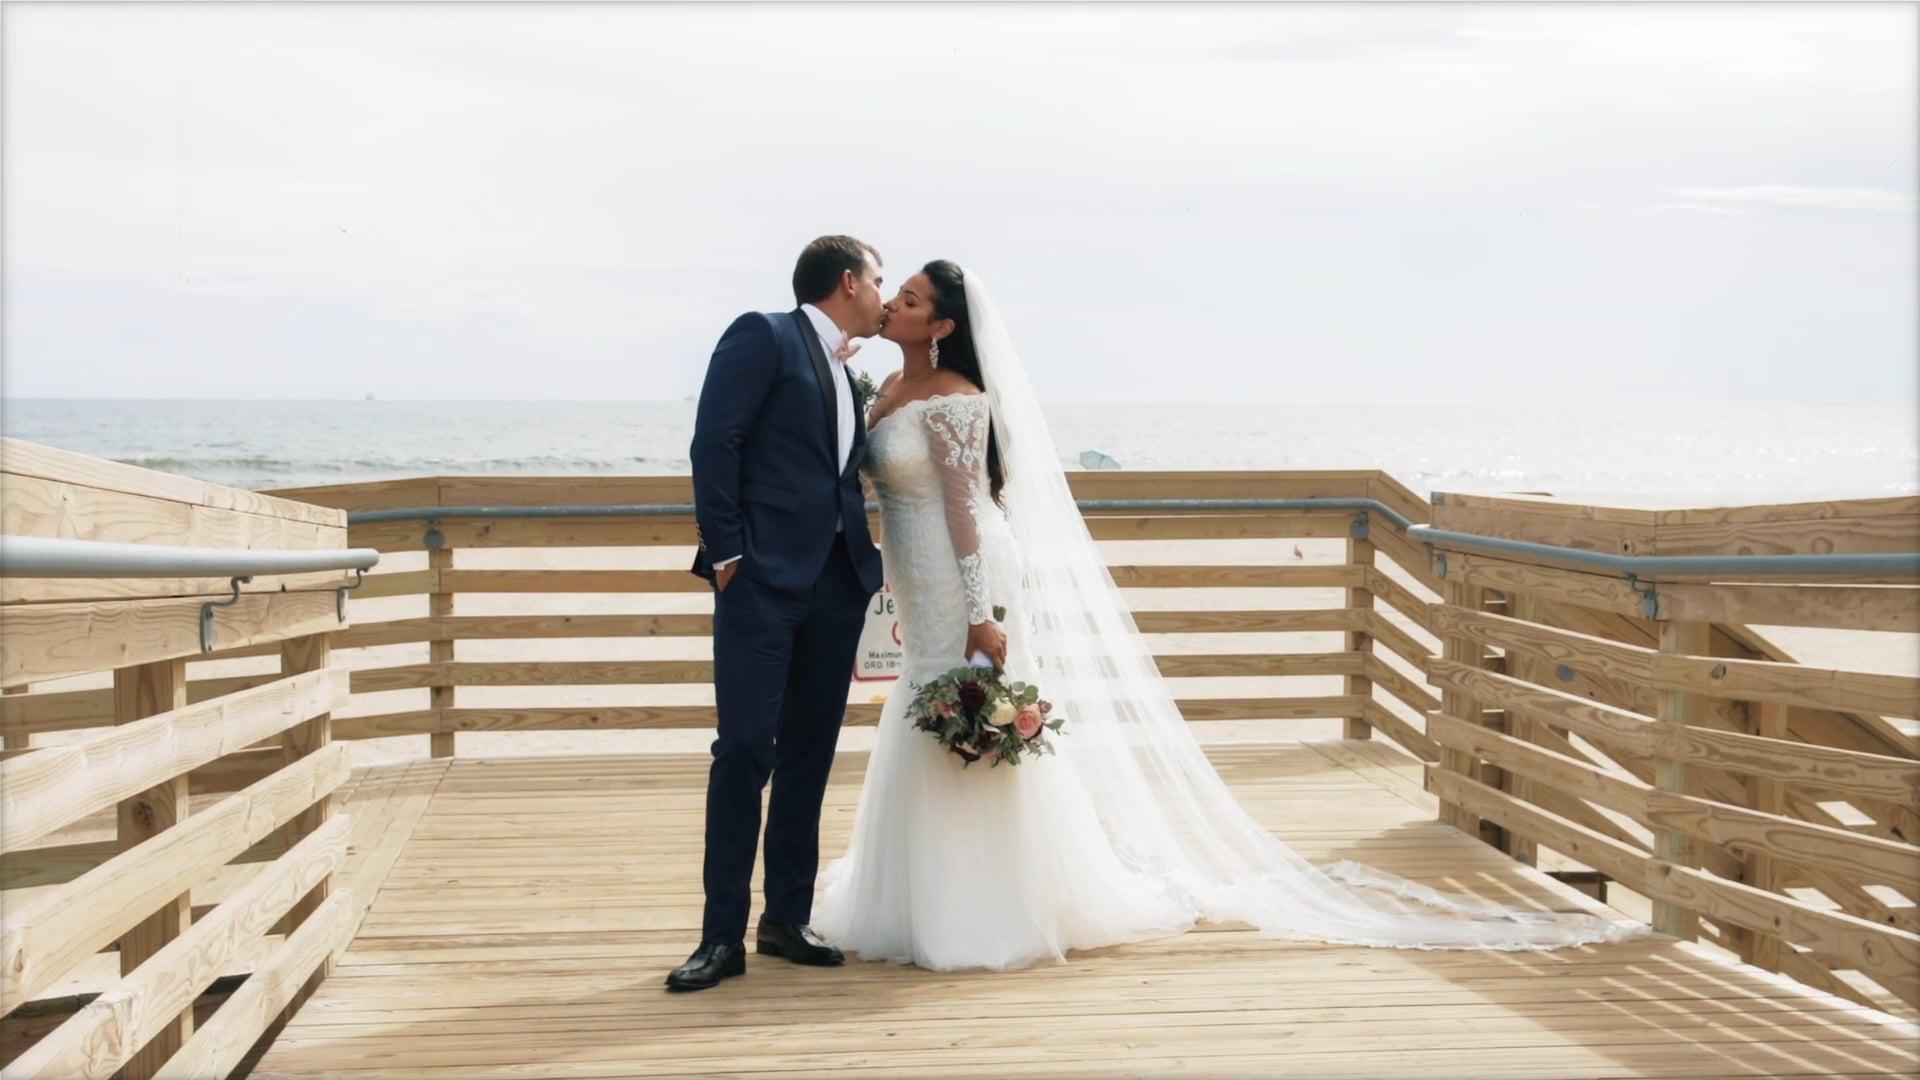 Wedding photography & video. Wedding DJ | NJ DJ | PA DJ | Bilingual Spanish & English DJ & MCs - BY TWK Events